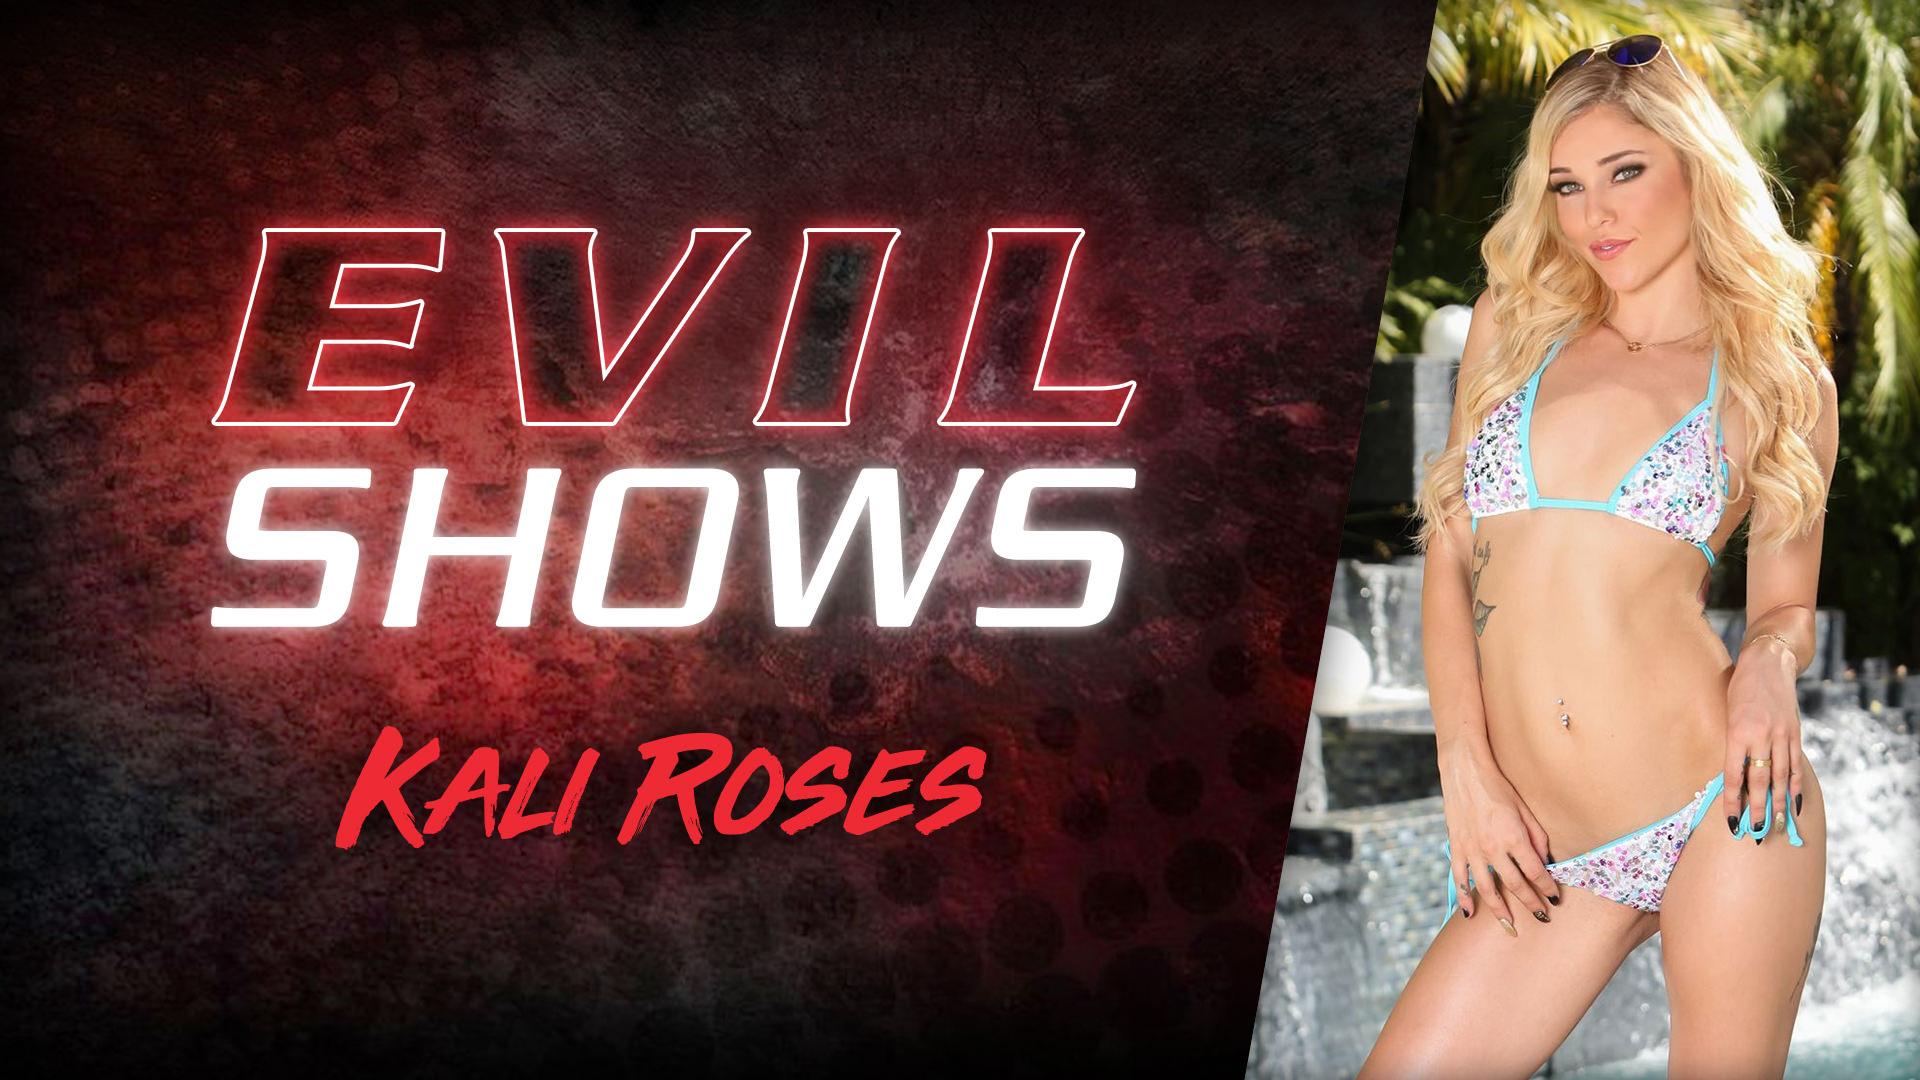 Evil Shows - Kali Roses - Kali Roses 1